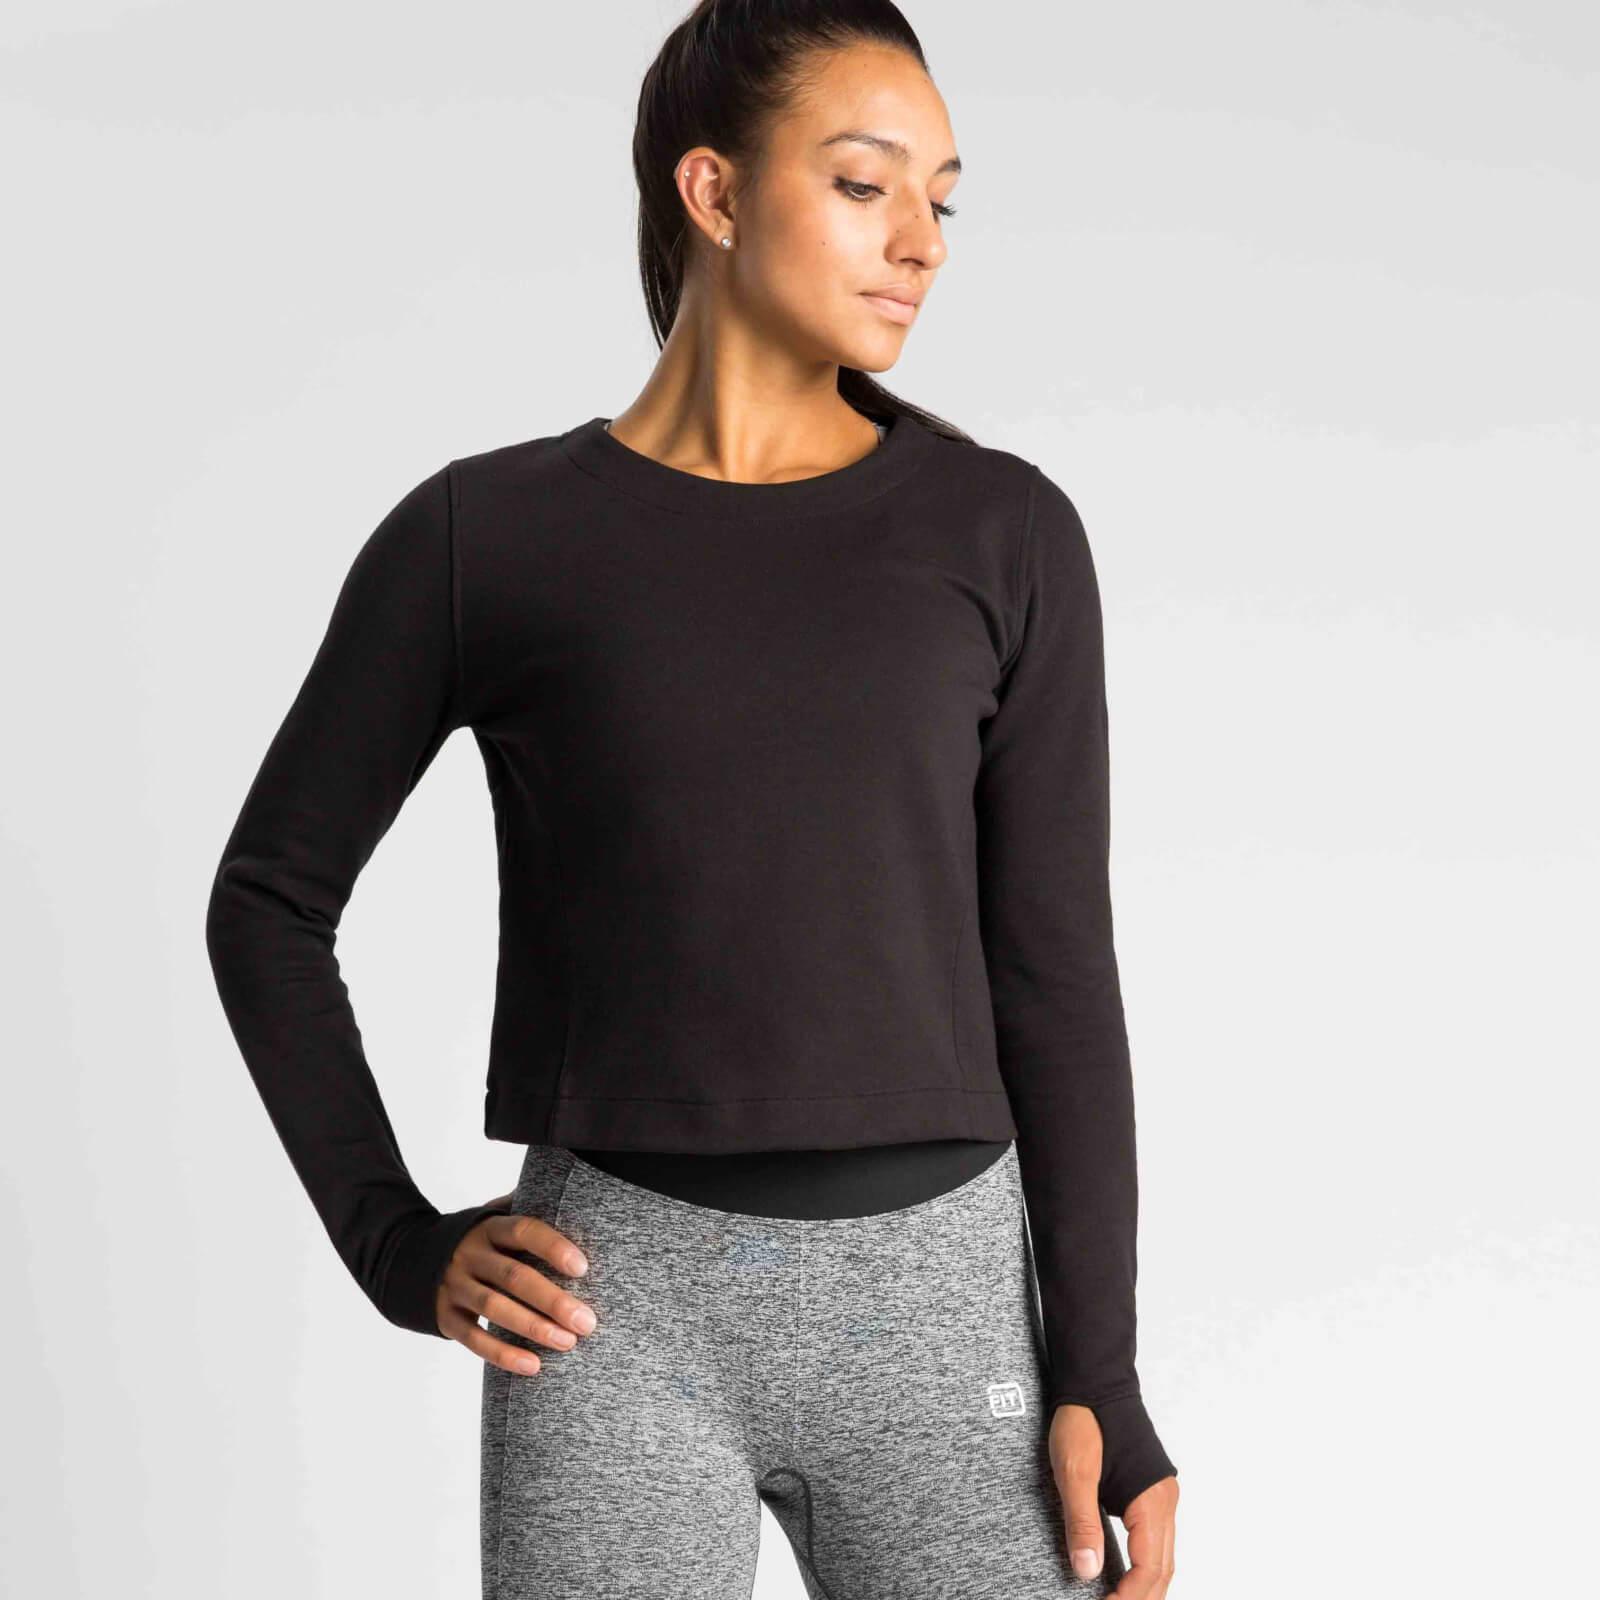 IdealFit Pro Tech Crew Sweatshirt - Black - S - Black